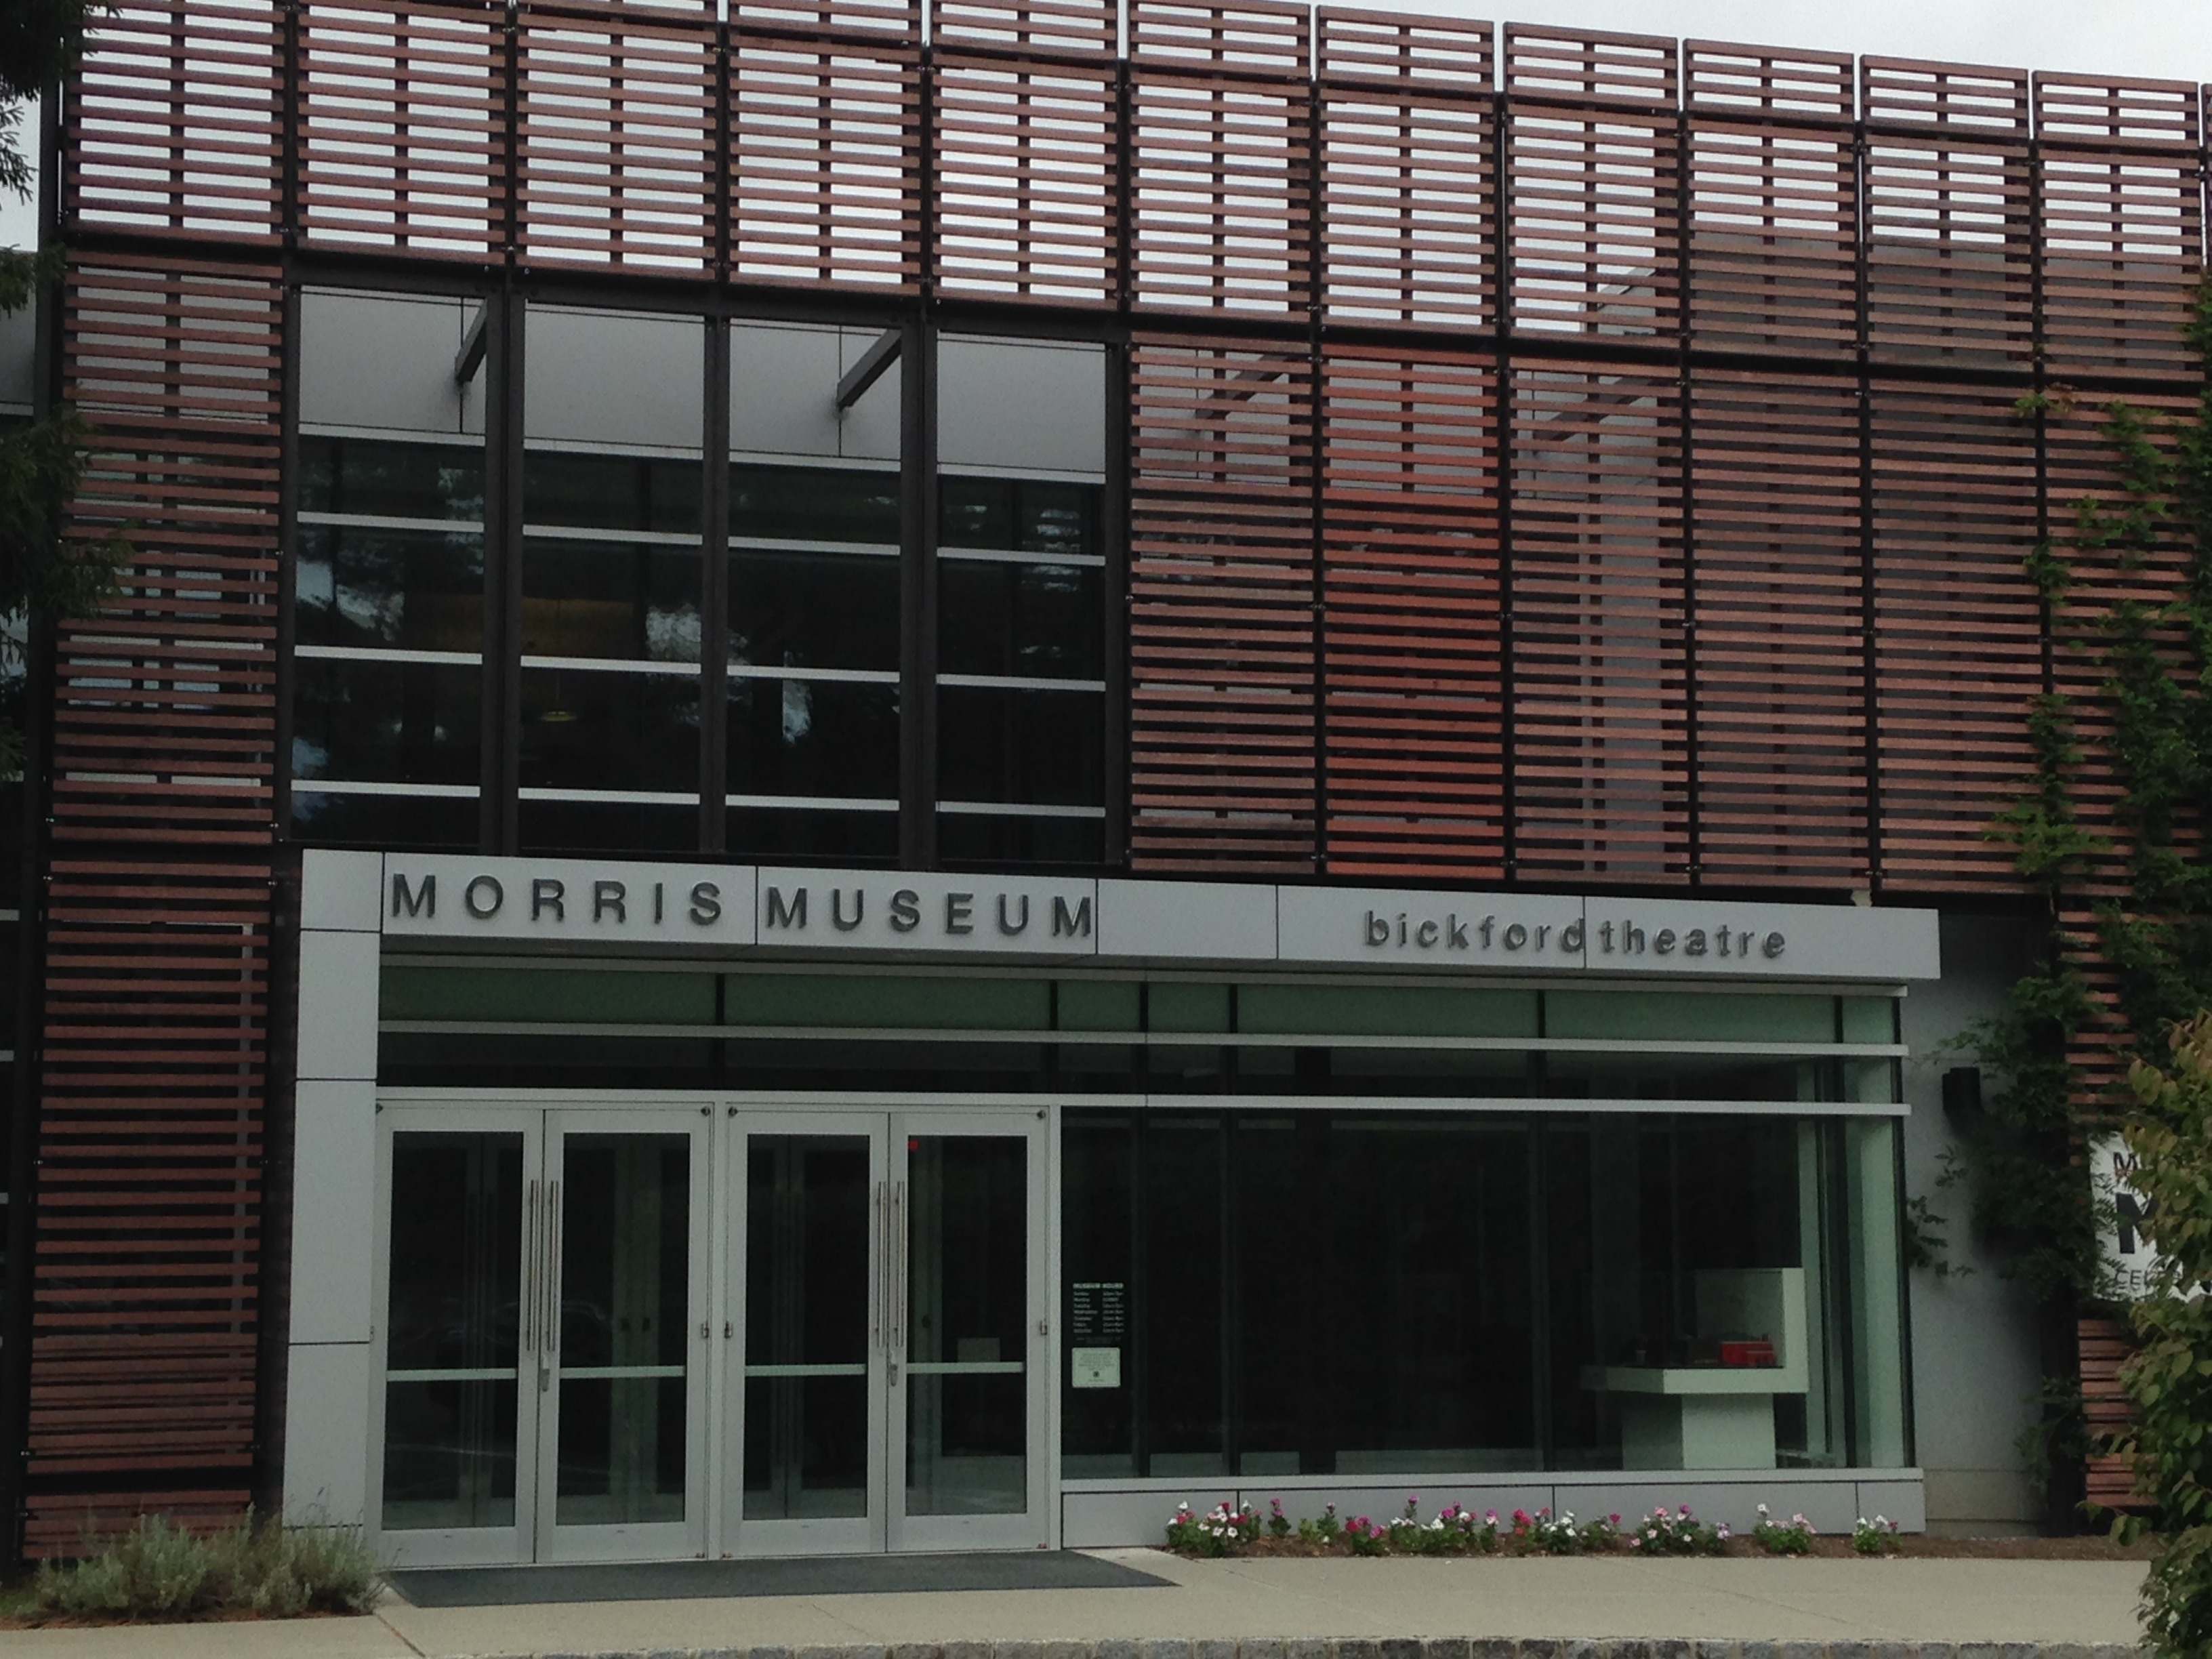 8fc8d640f2438dc6eb45_morris_museums.jpg